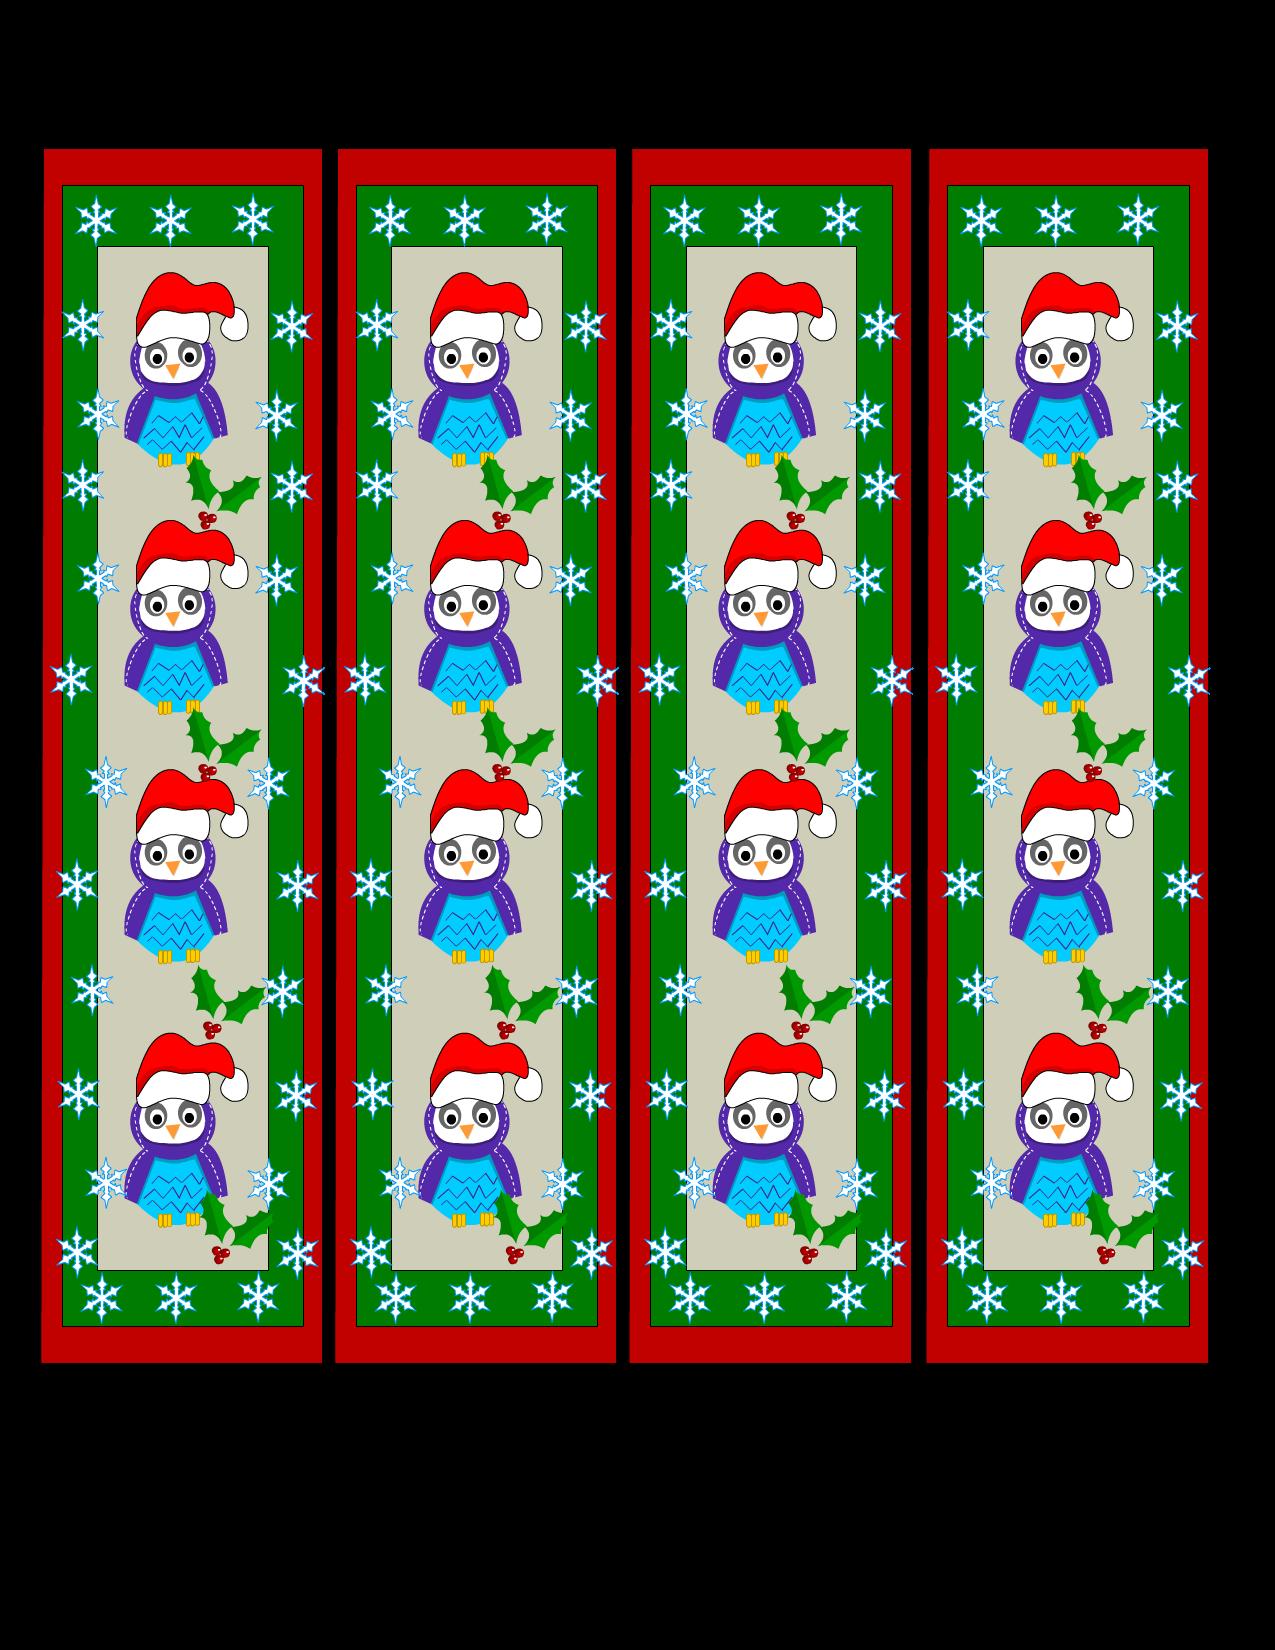 Free Printable Christmas Bookmarks With Owls Cute Bookmarks Bookmarks Kids Christmas Bookmarks